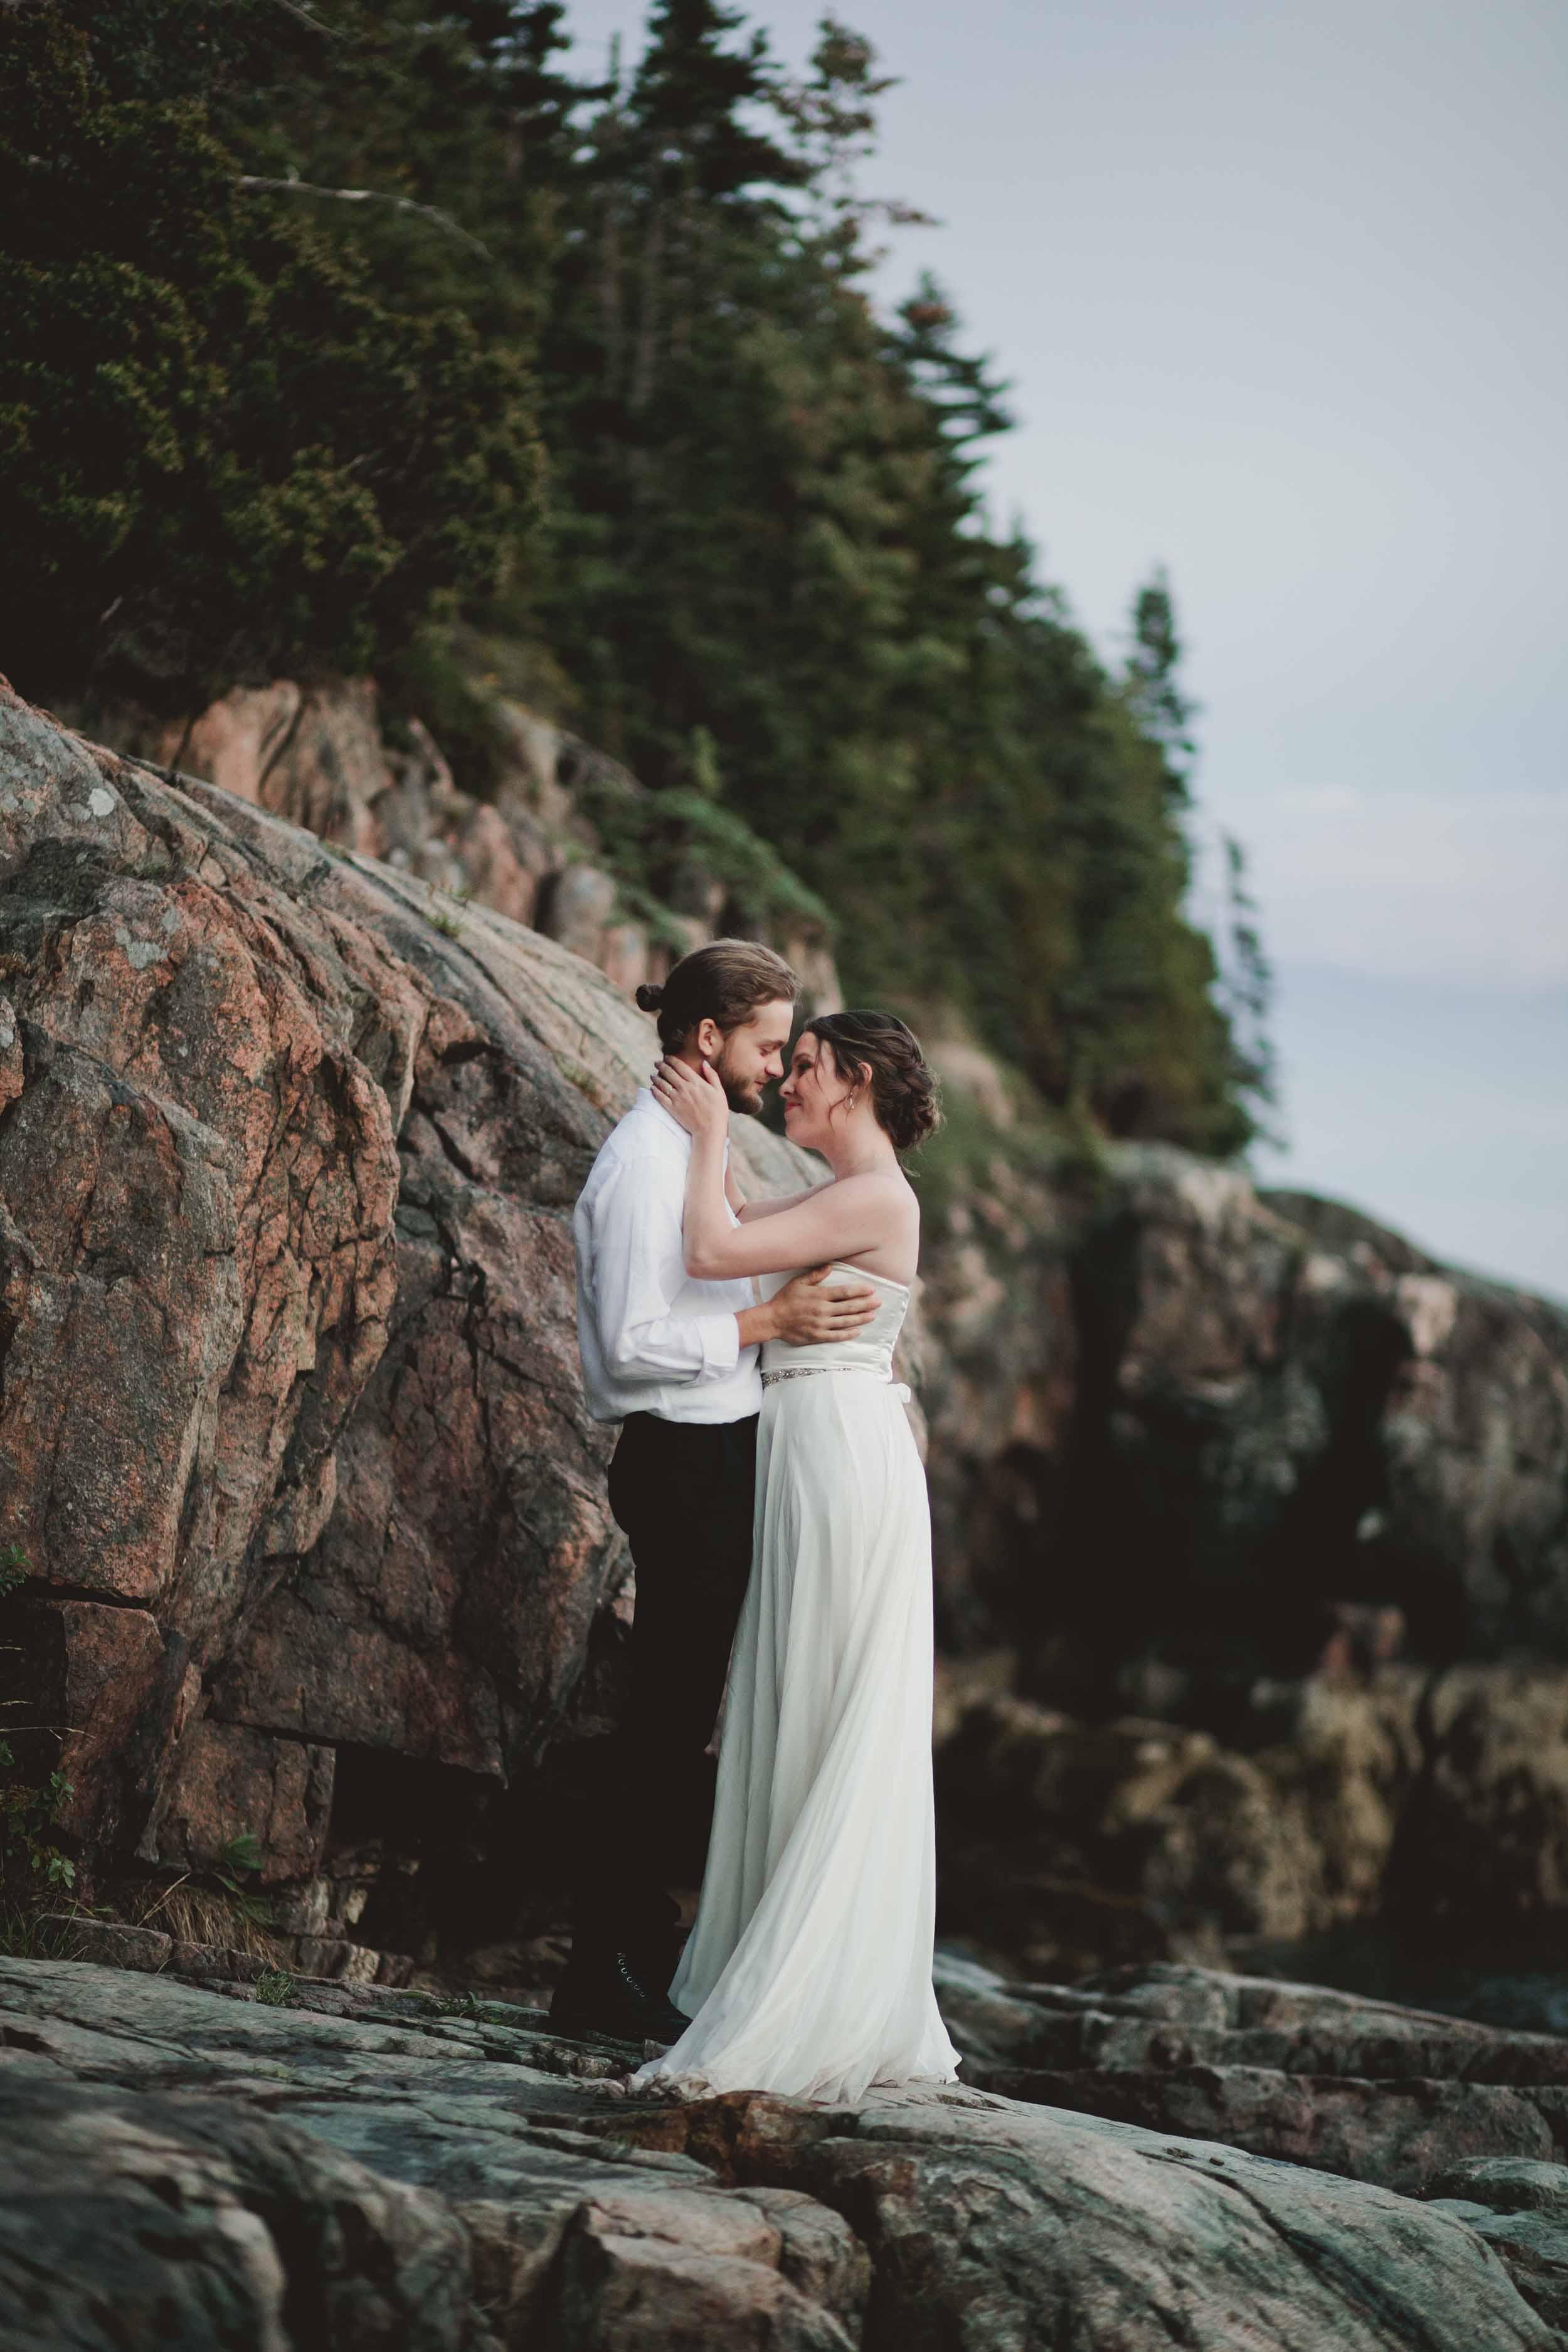 Maine-Elopement-Photographer43.jpg